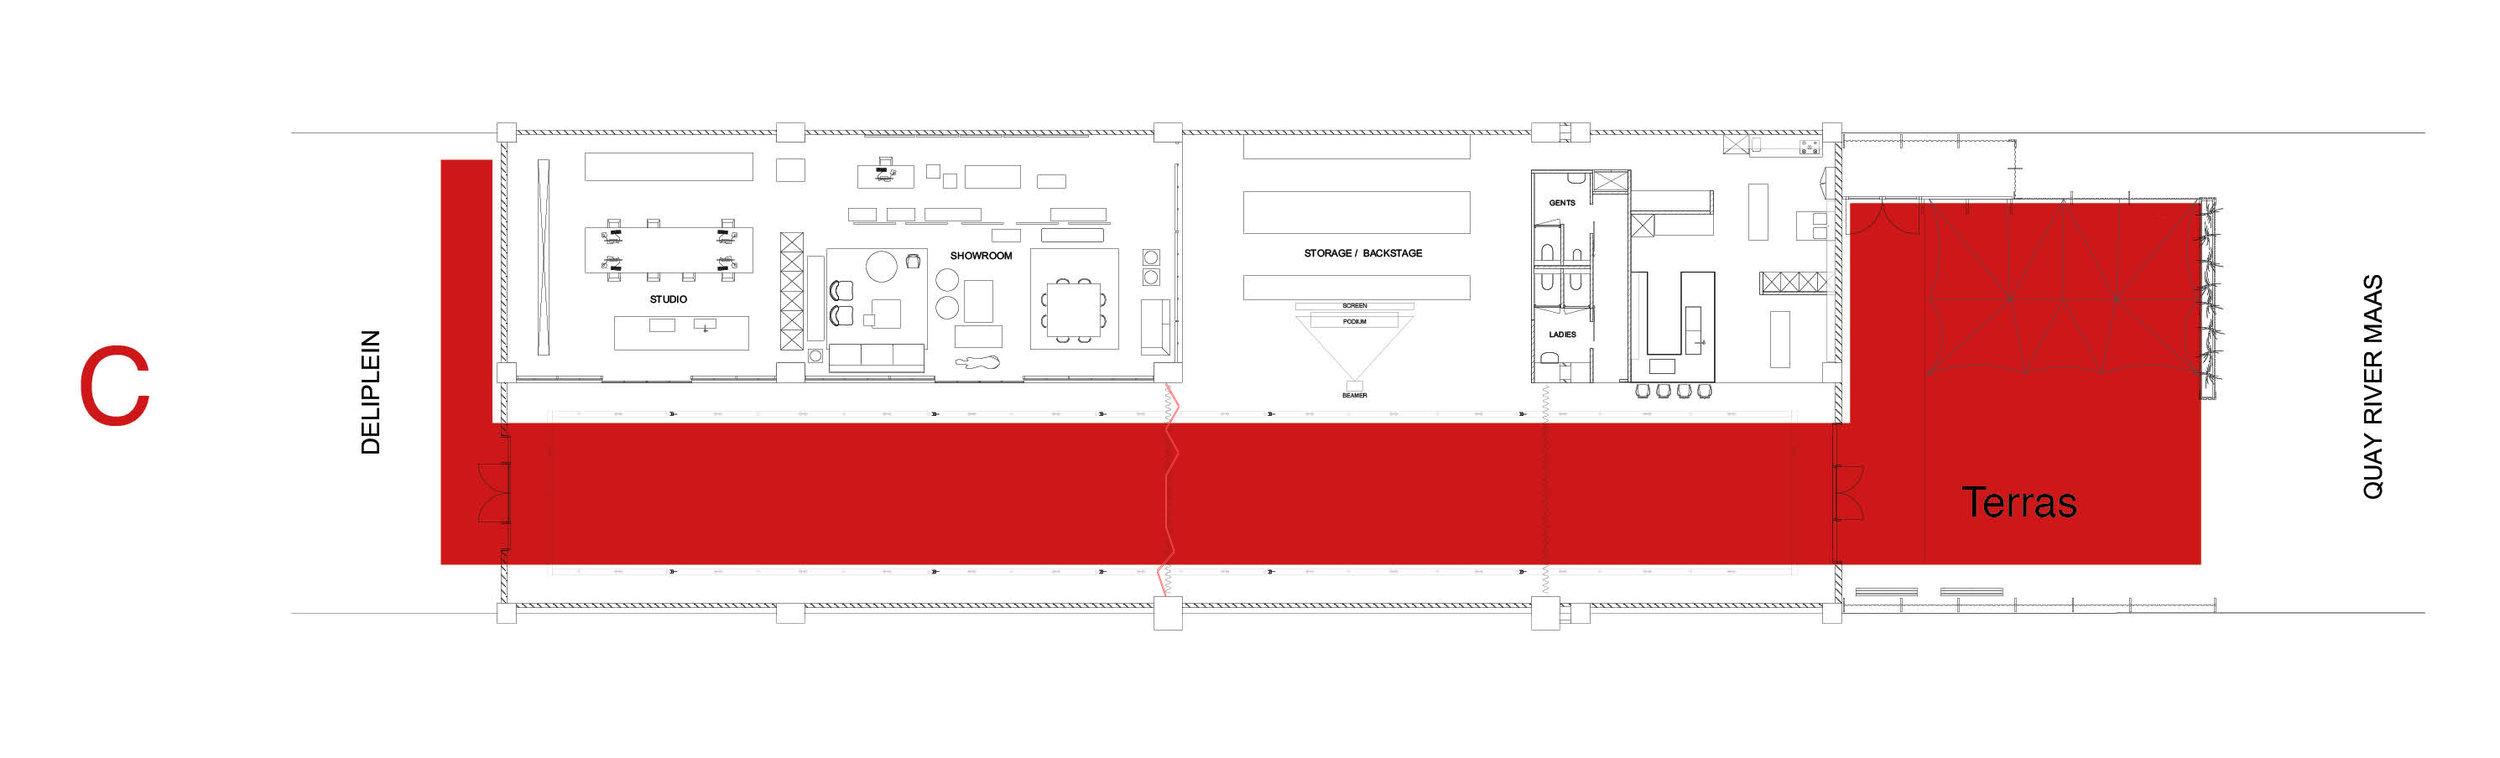 The Arts Club - Loods - Plattegrond - Optie C.jpg